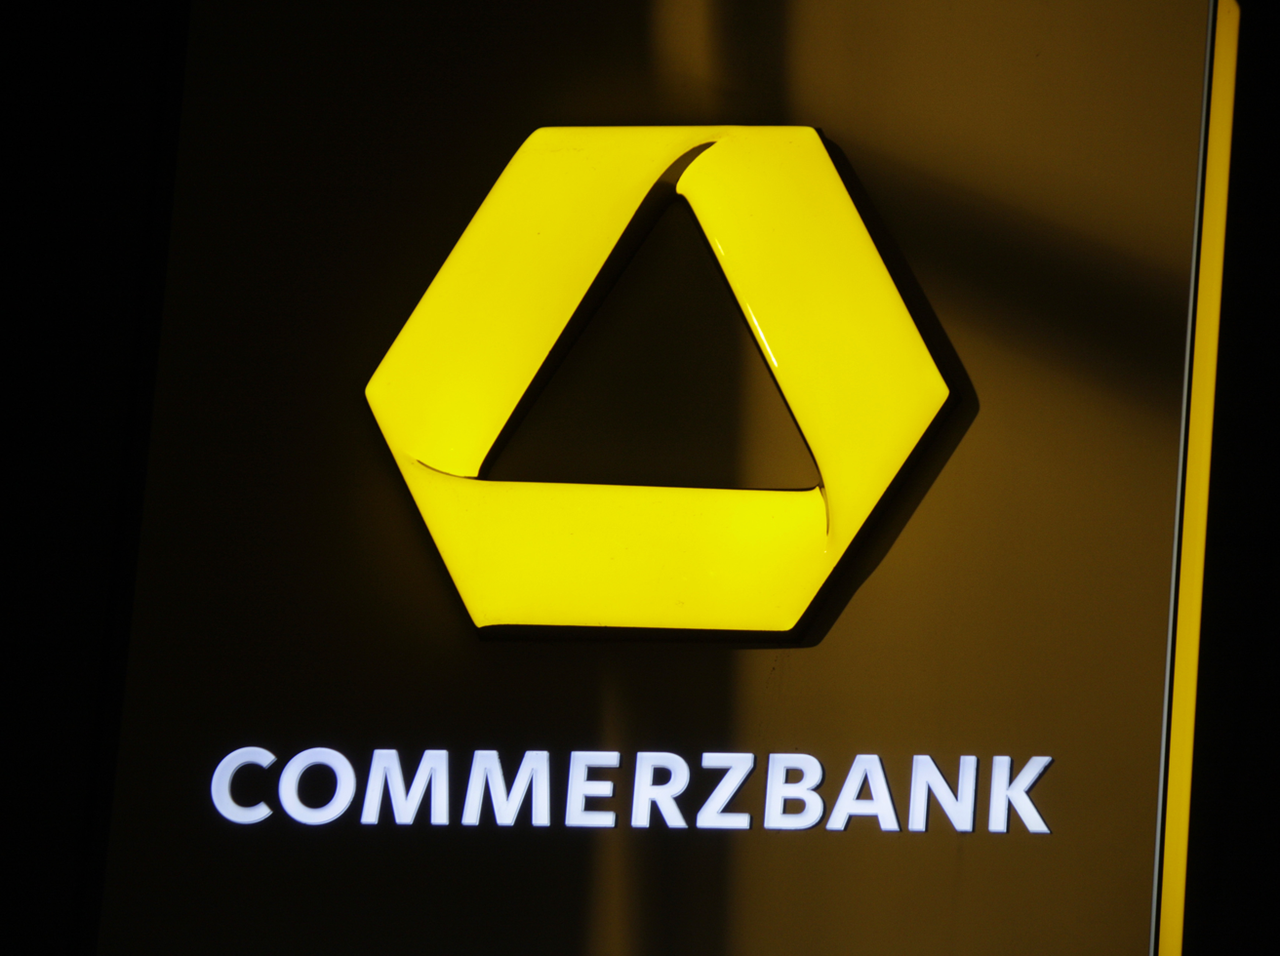 Wann öffnen Banken Wieder